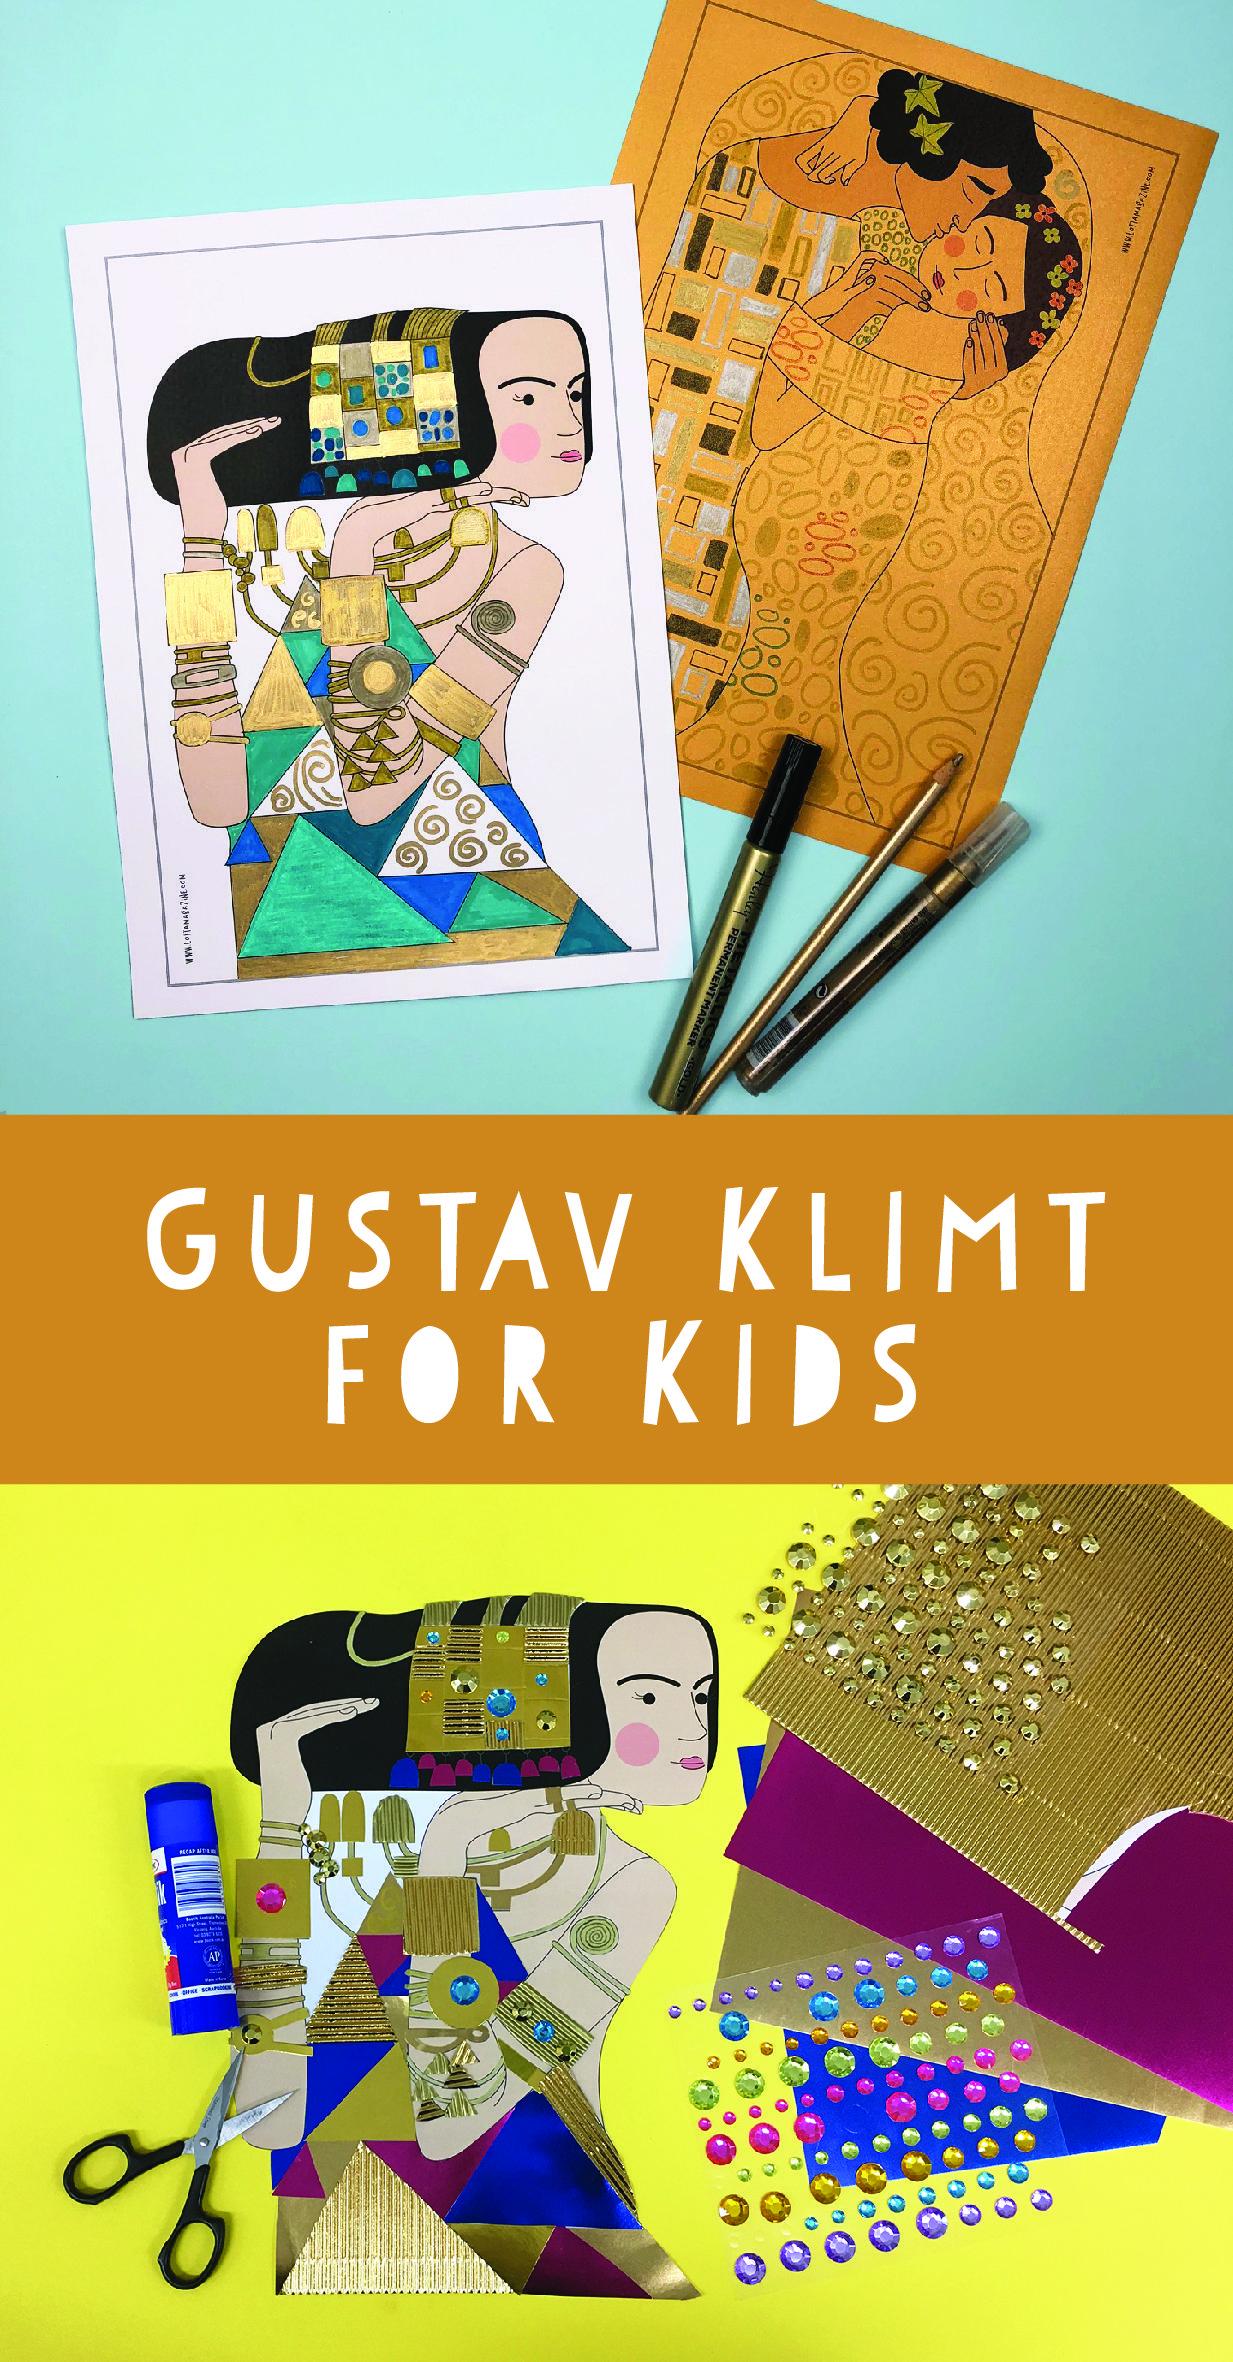 Klimt for kids gustav klimt golden girls colouring pages fun